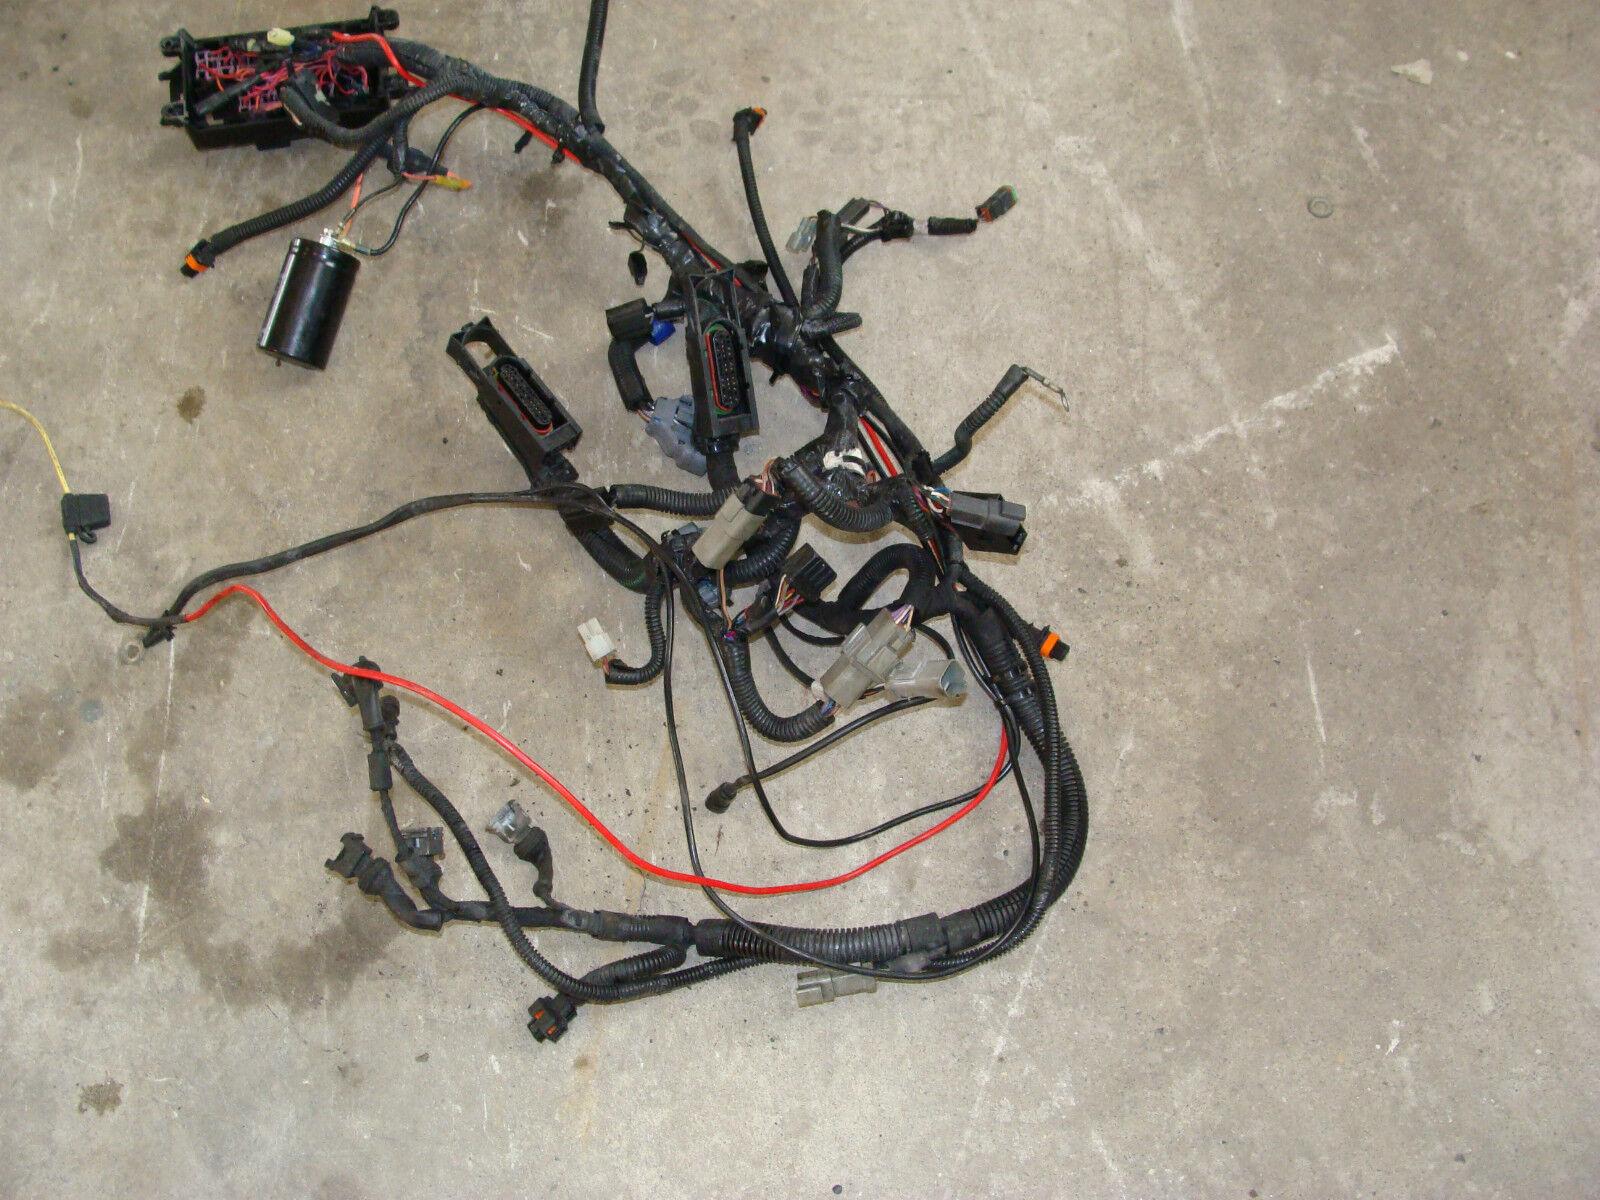 05 ski doo mach z renegade 1000 sdi wiring harness wire electric 05 ski doo mach z renegade 1000 sdi wiring harness wire electric summit 3 3 of 6